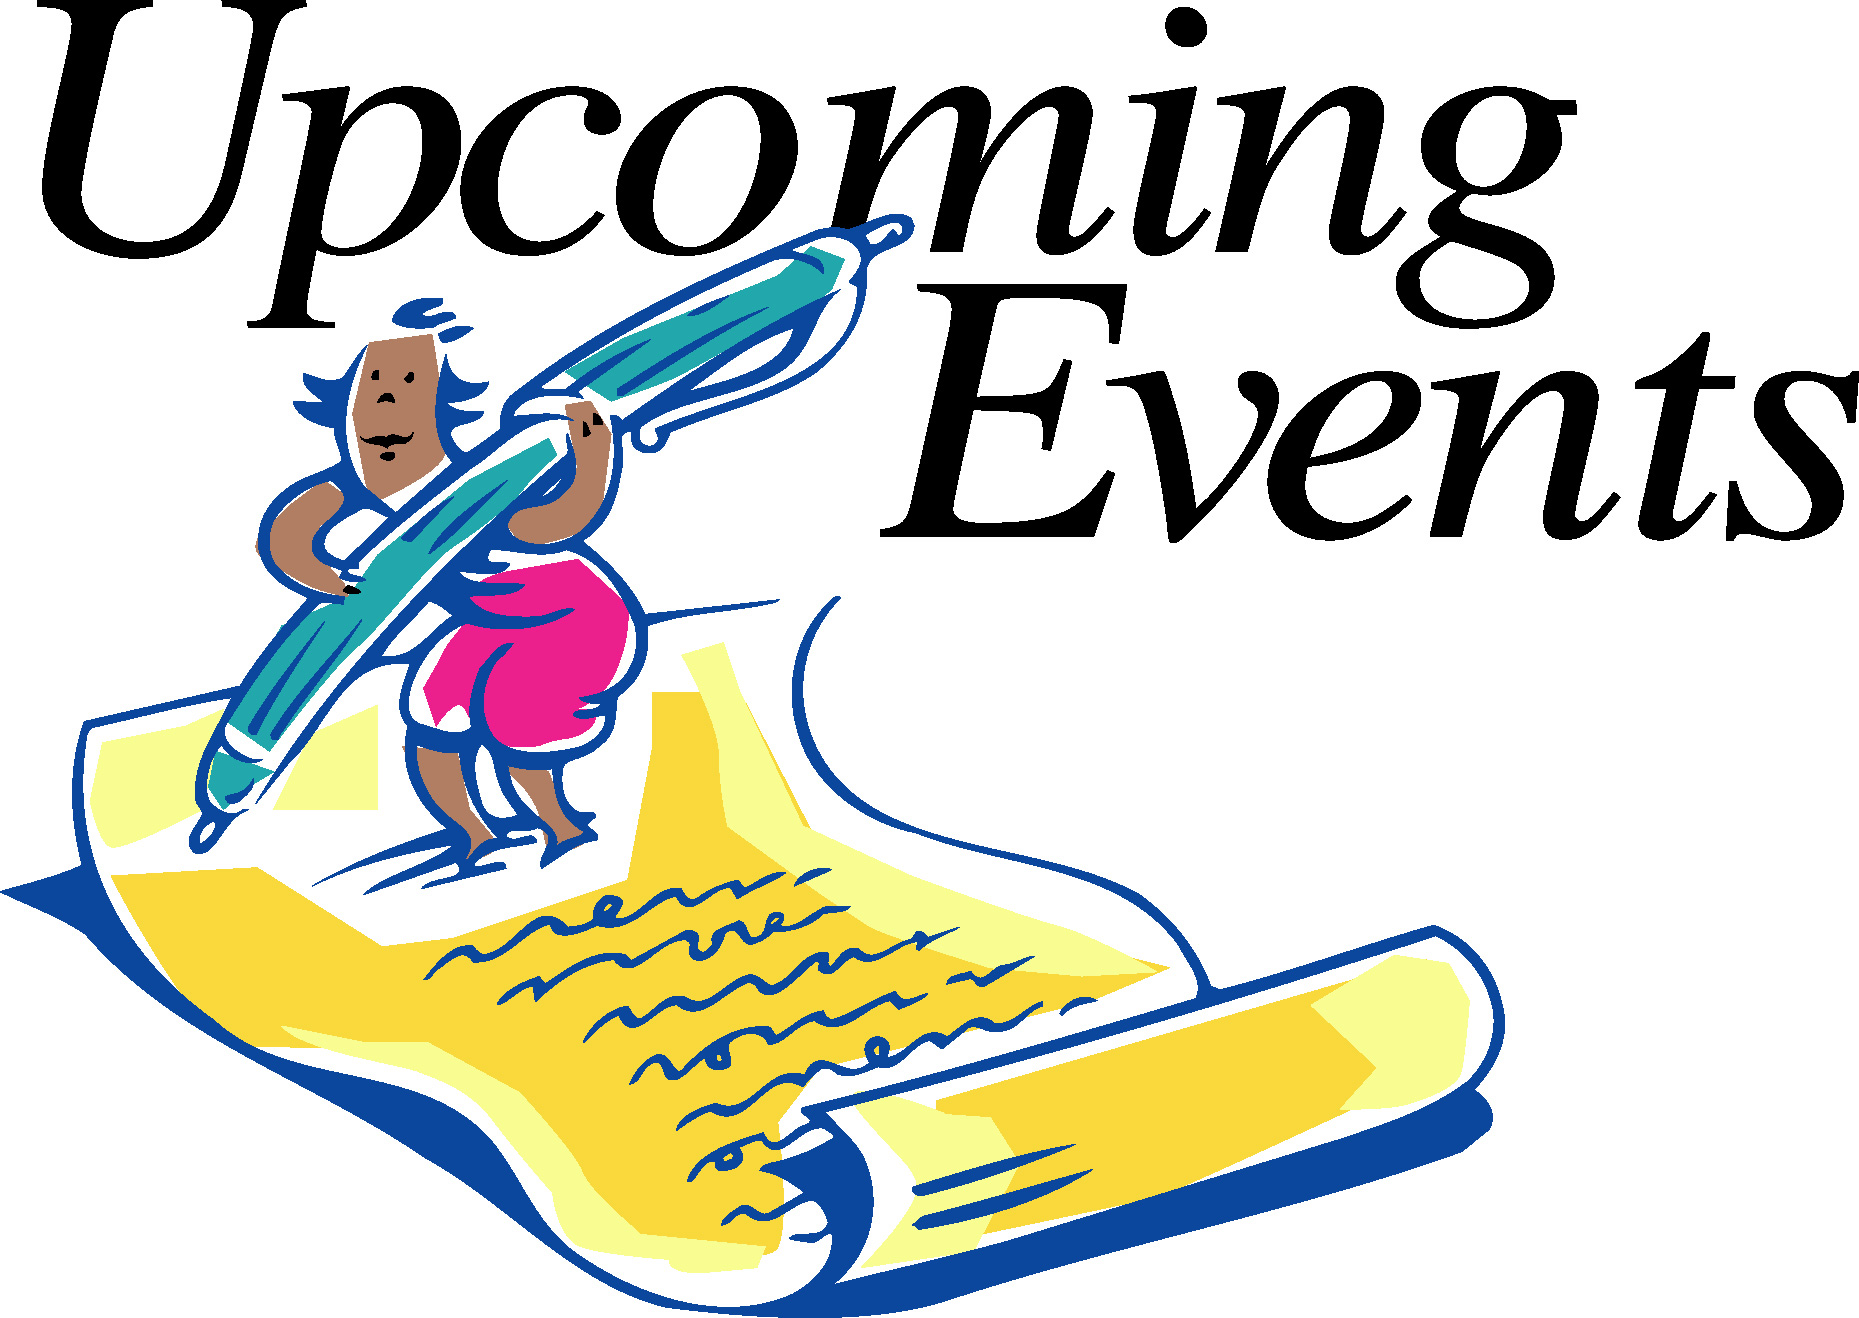 event clipart-event clipart-3